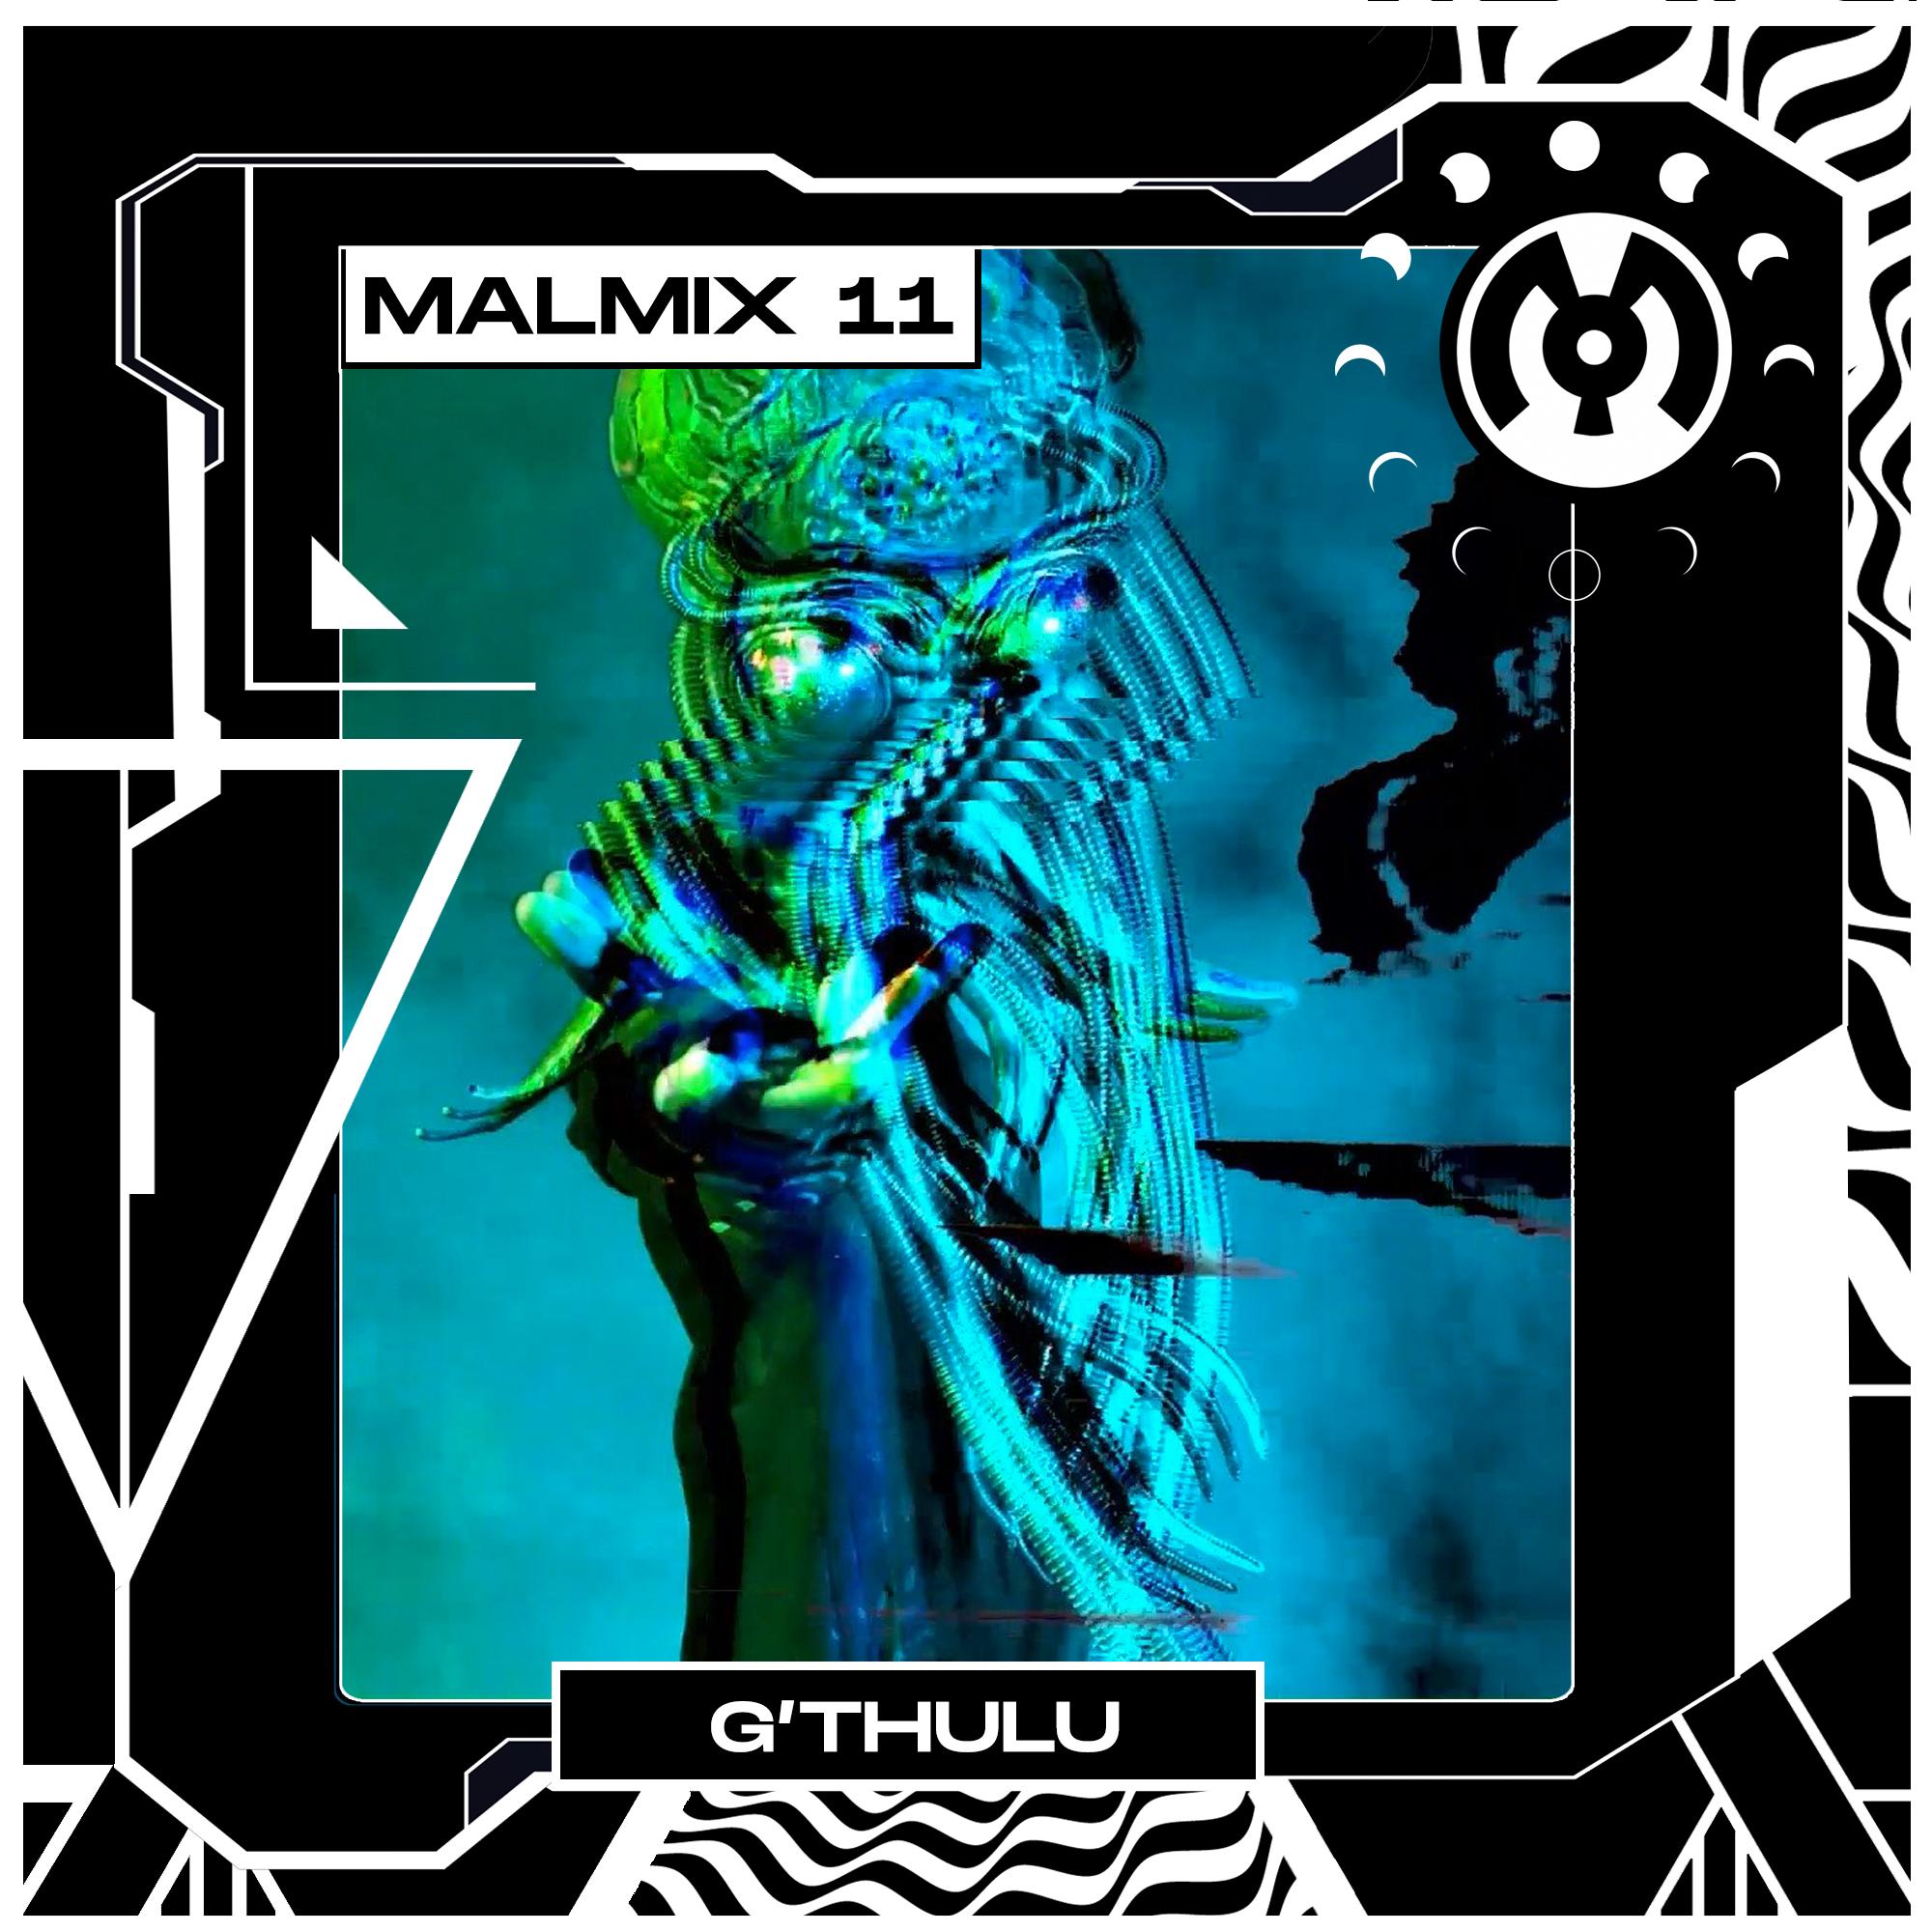 MalMix 11:  G'Thulu now on Soundcloud